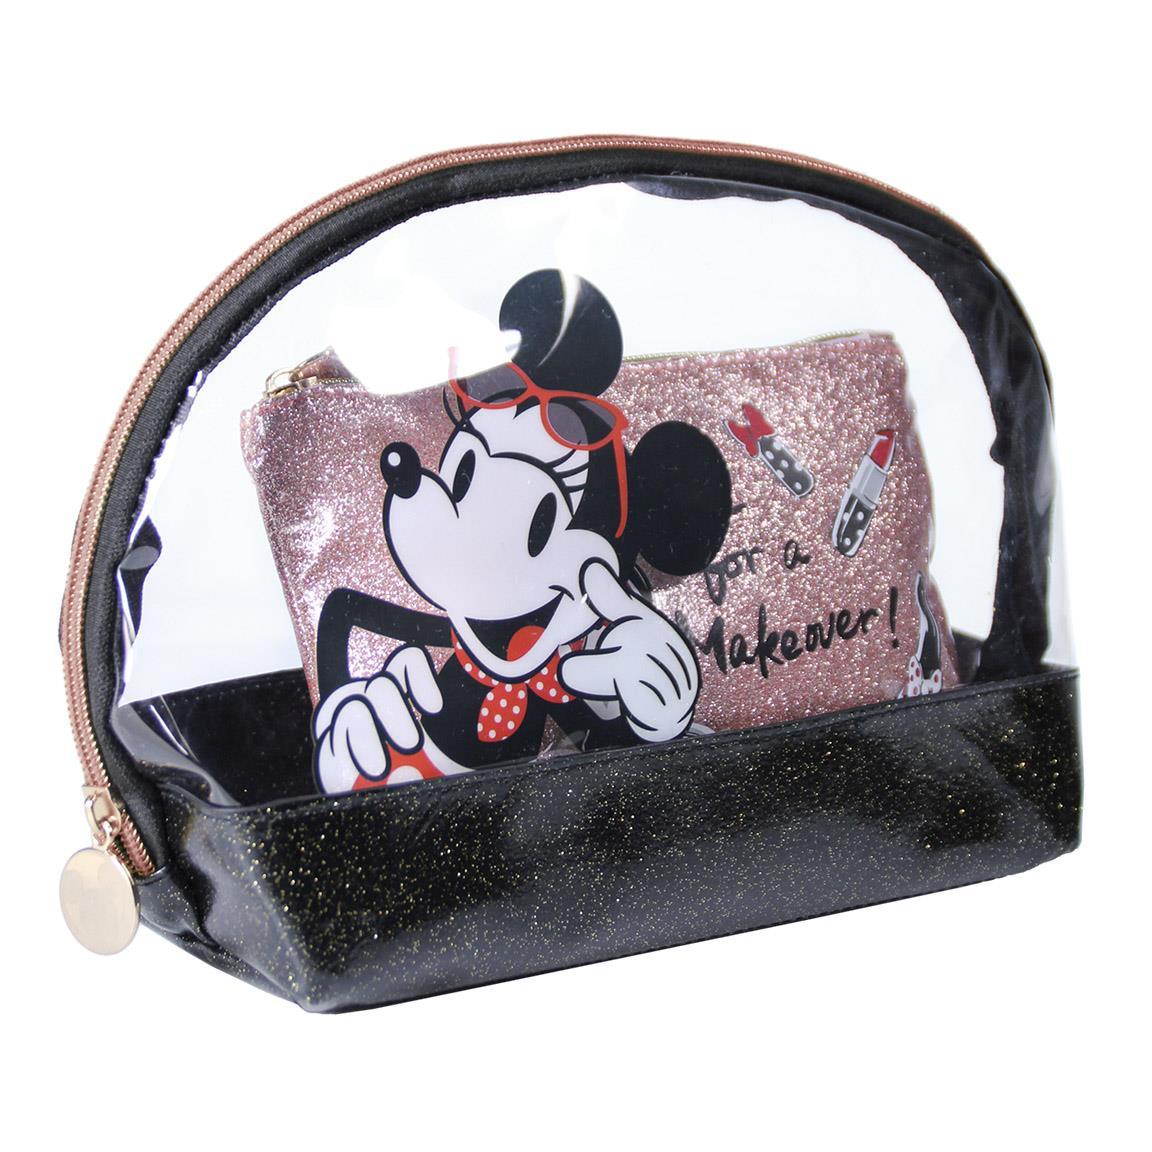 Minnie Beauty case